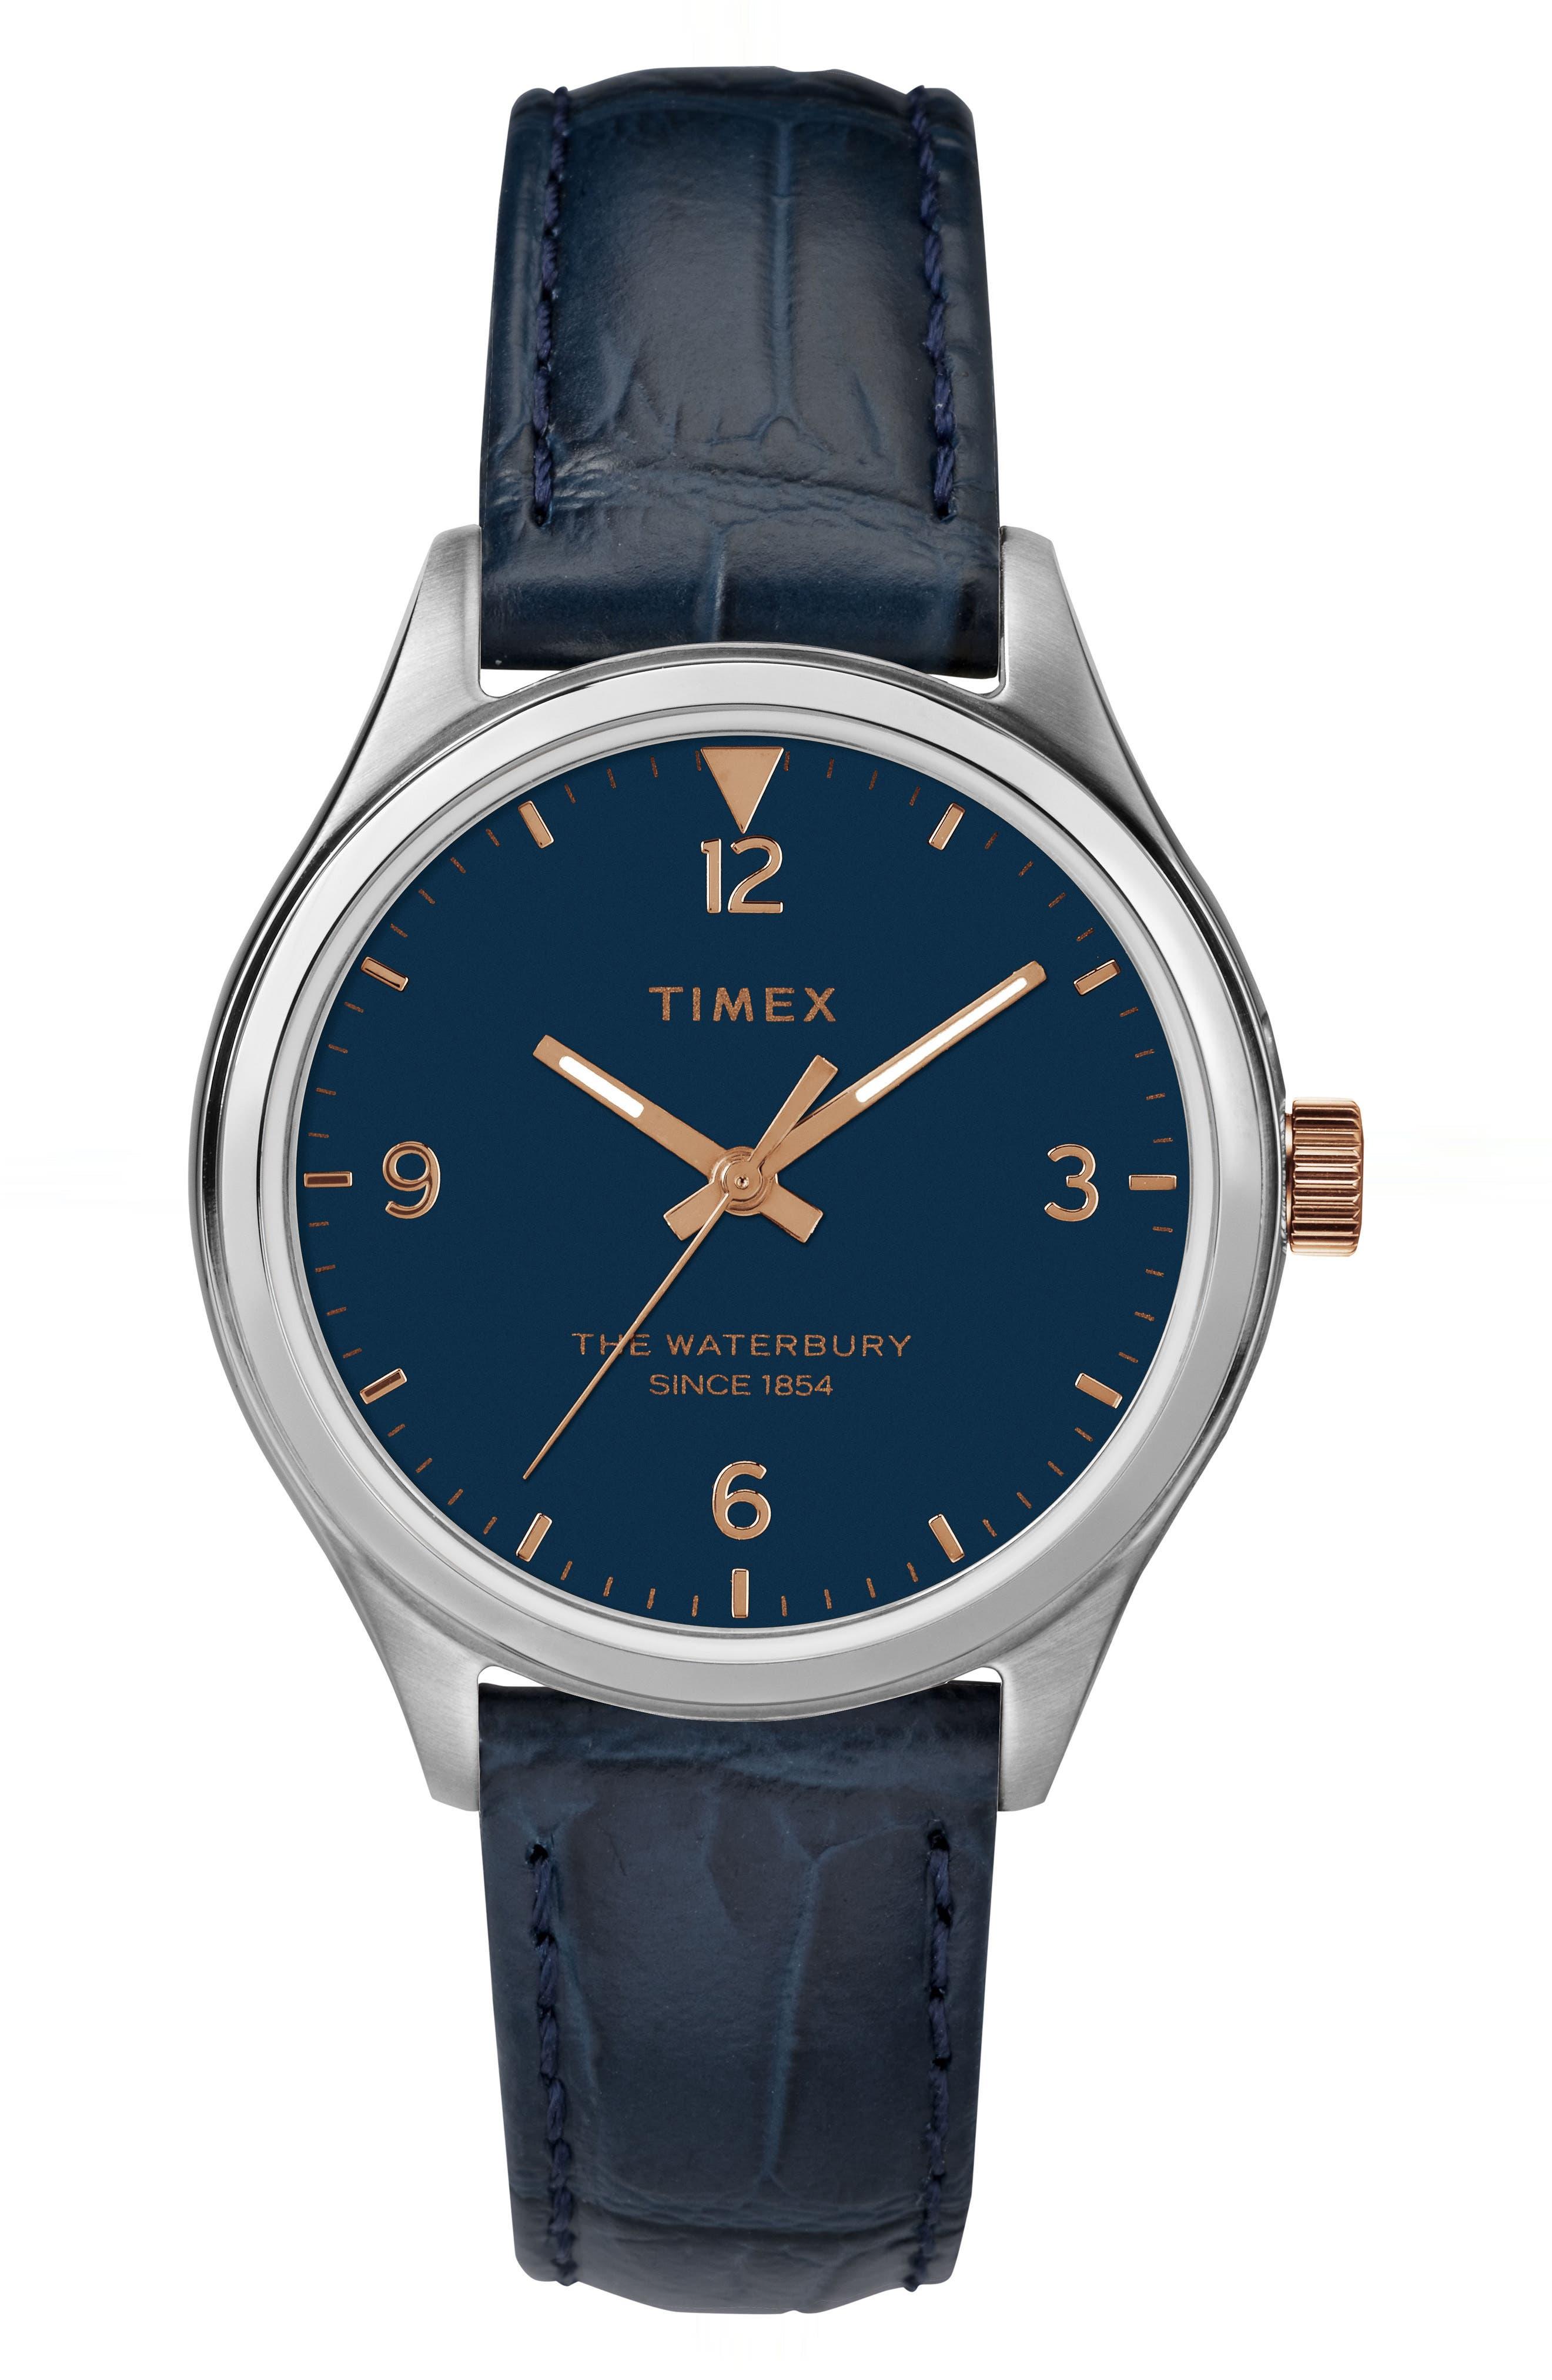 Timex Waterbury Leather Strap Watch,